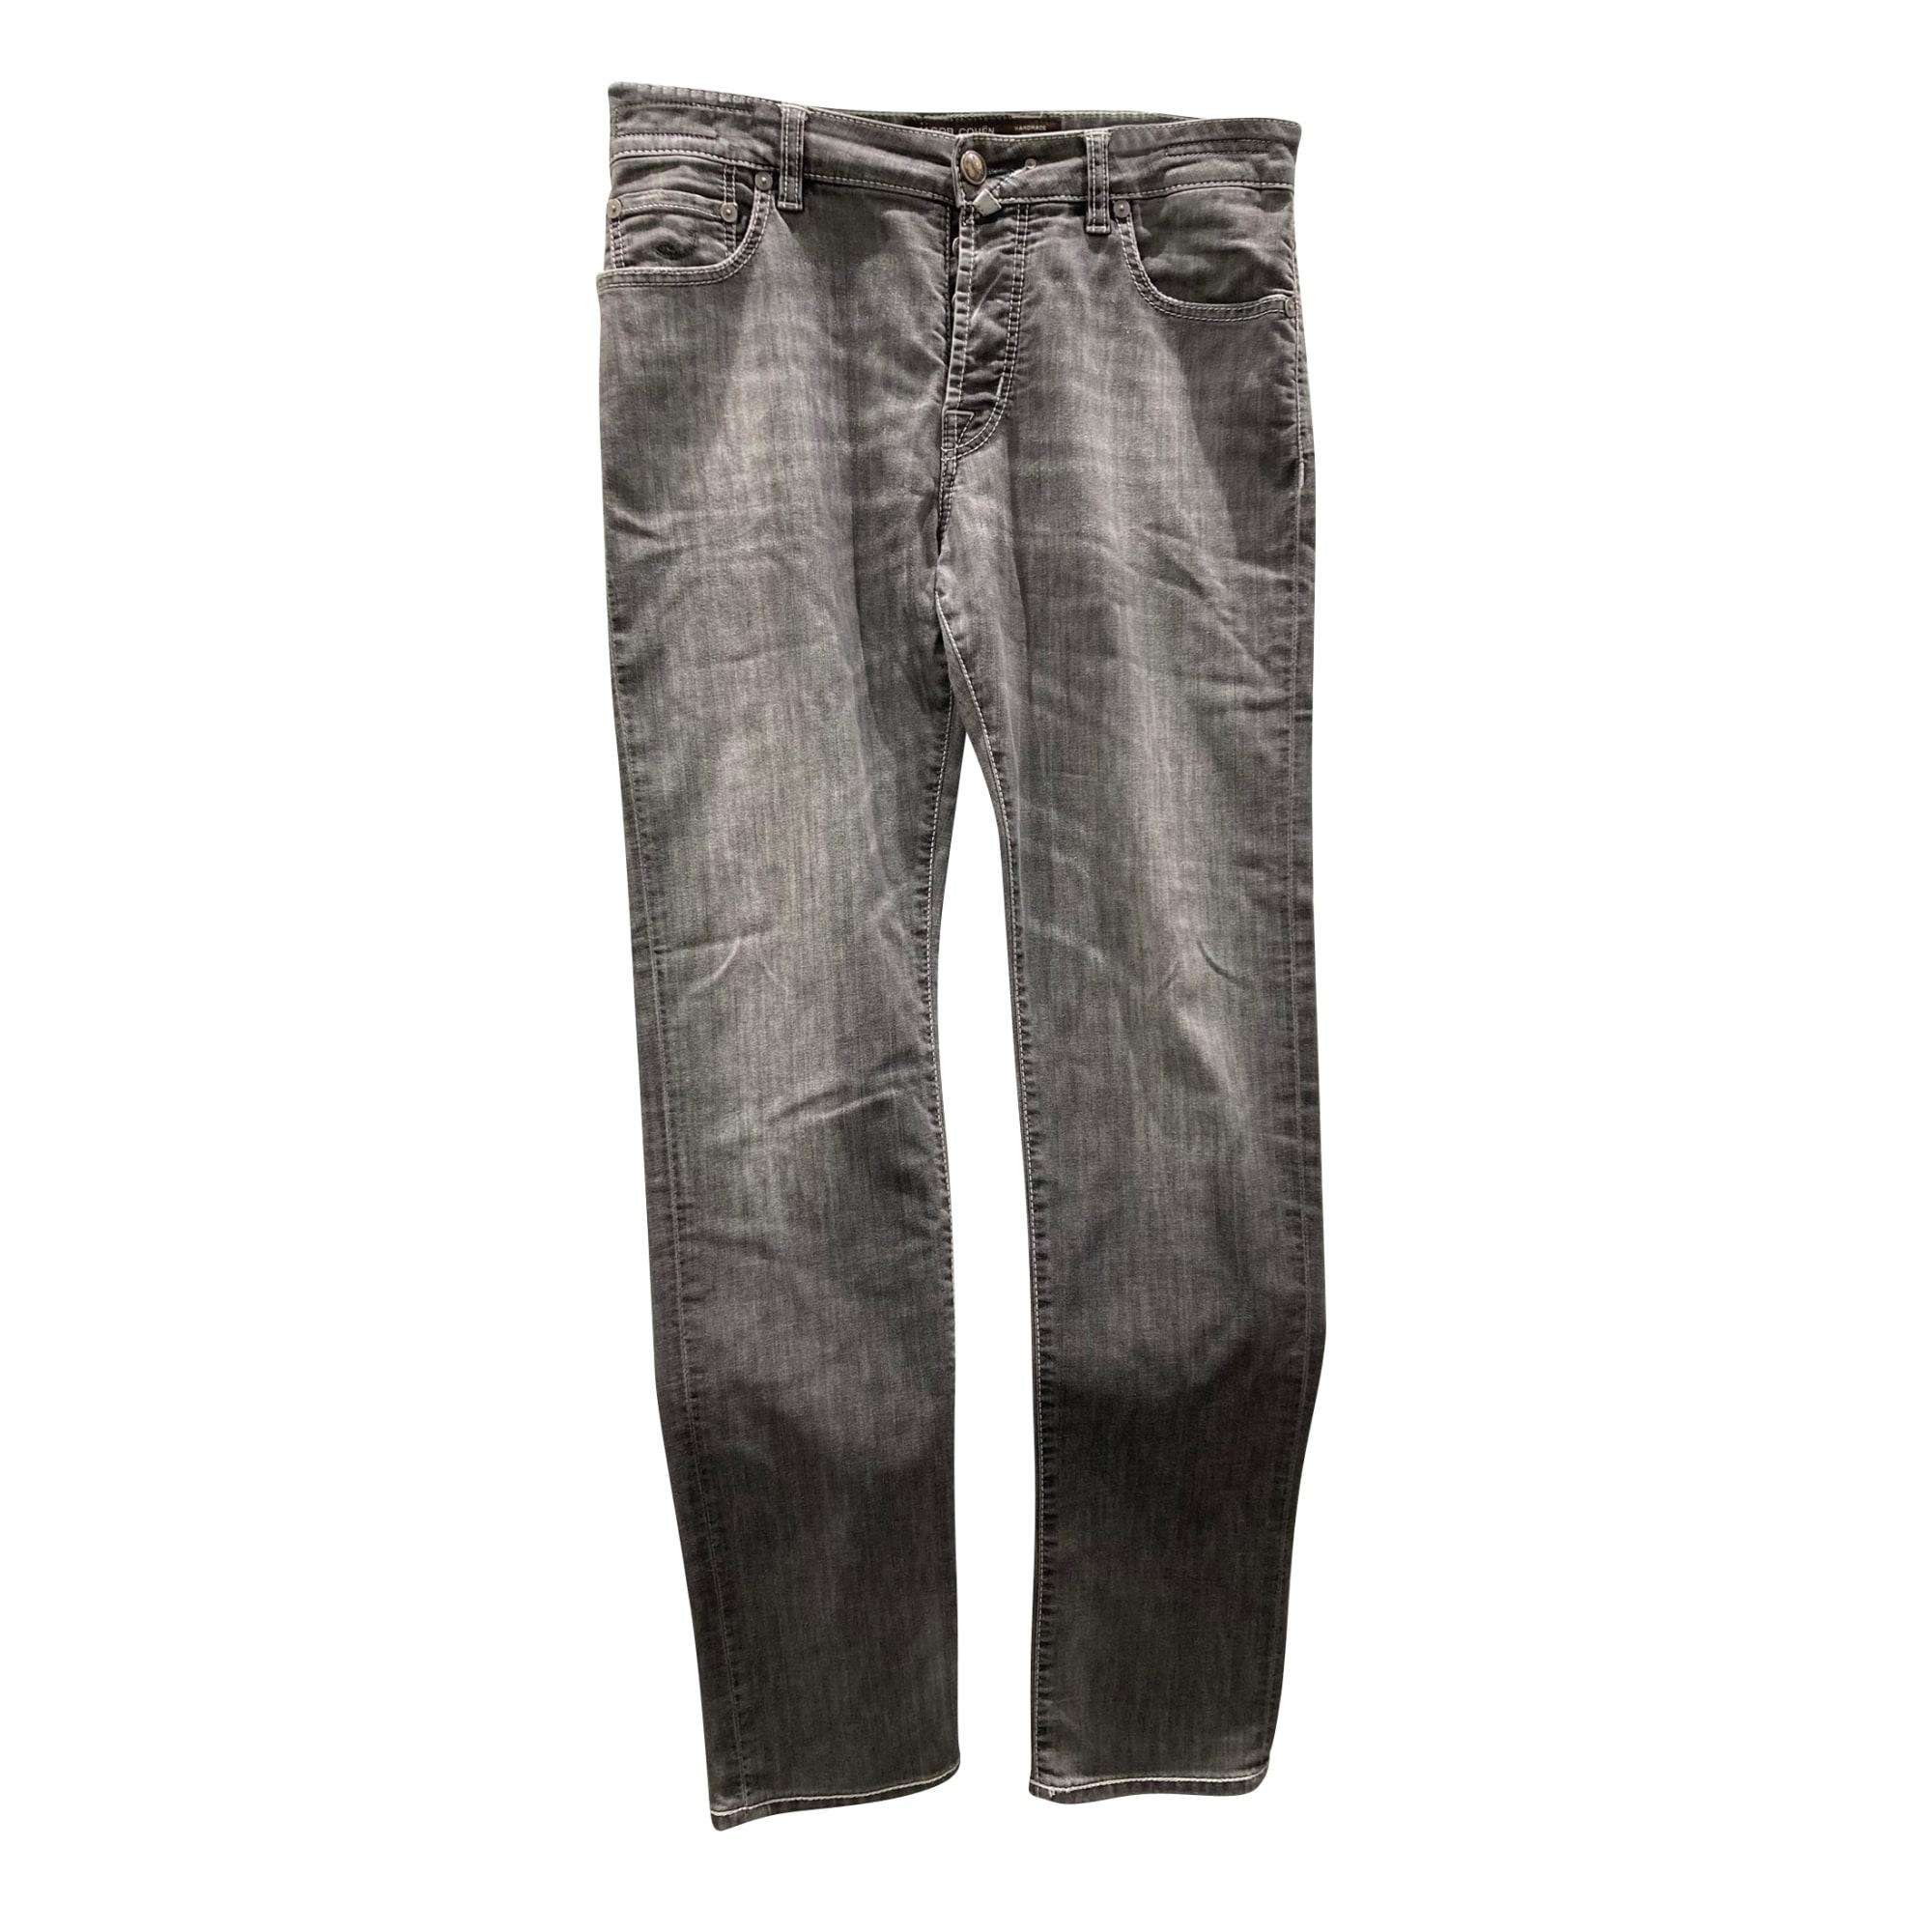 Straight Leg Jeans JACOB COHEN Gray, charcoal